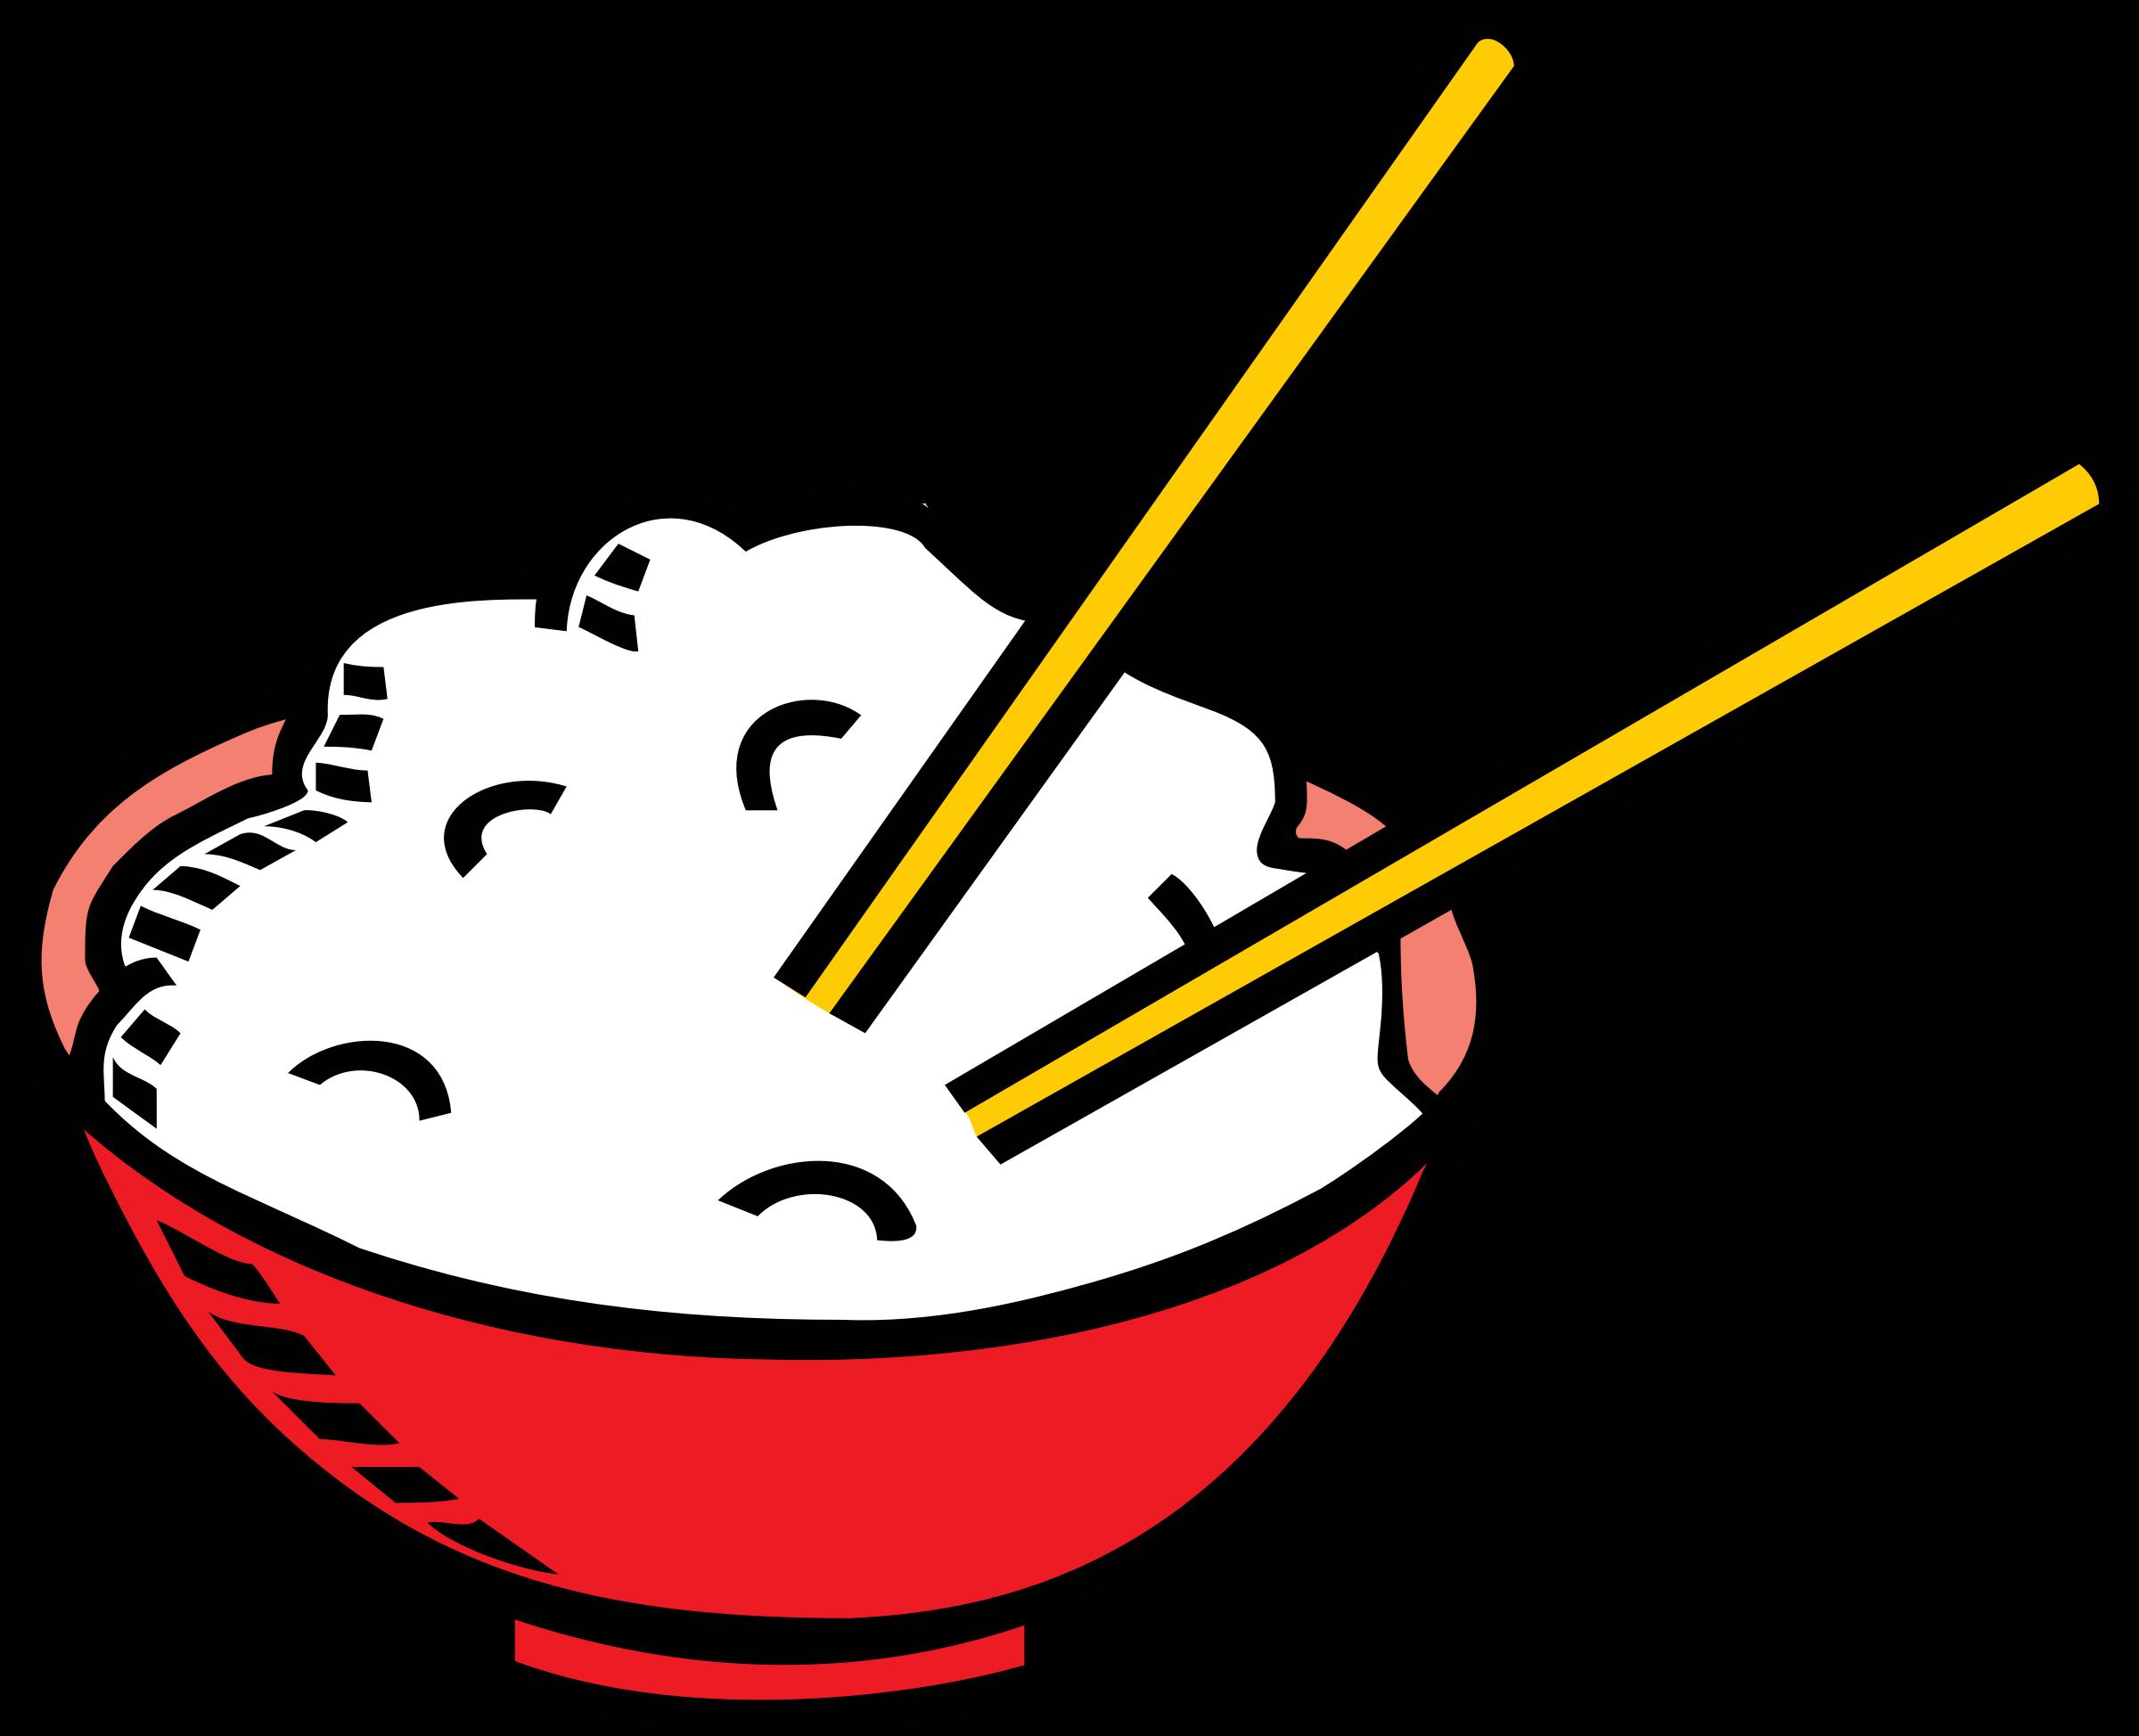 Chopsticks clipart. Free cliparts download clip